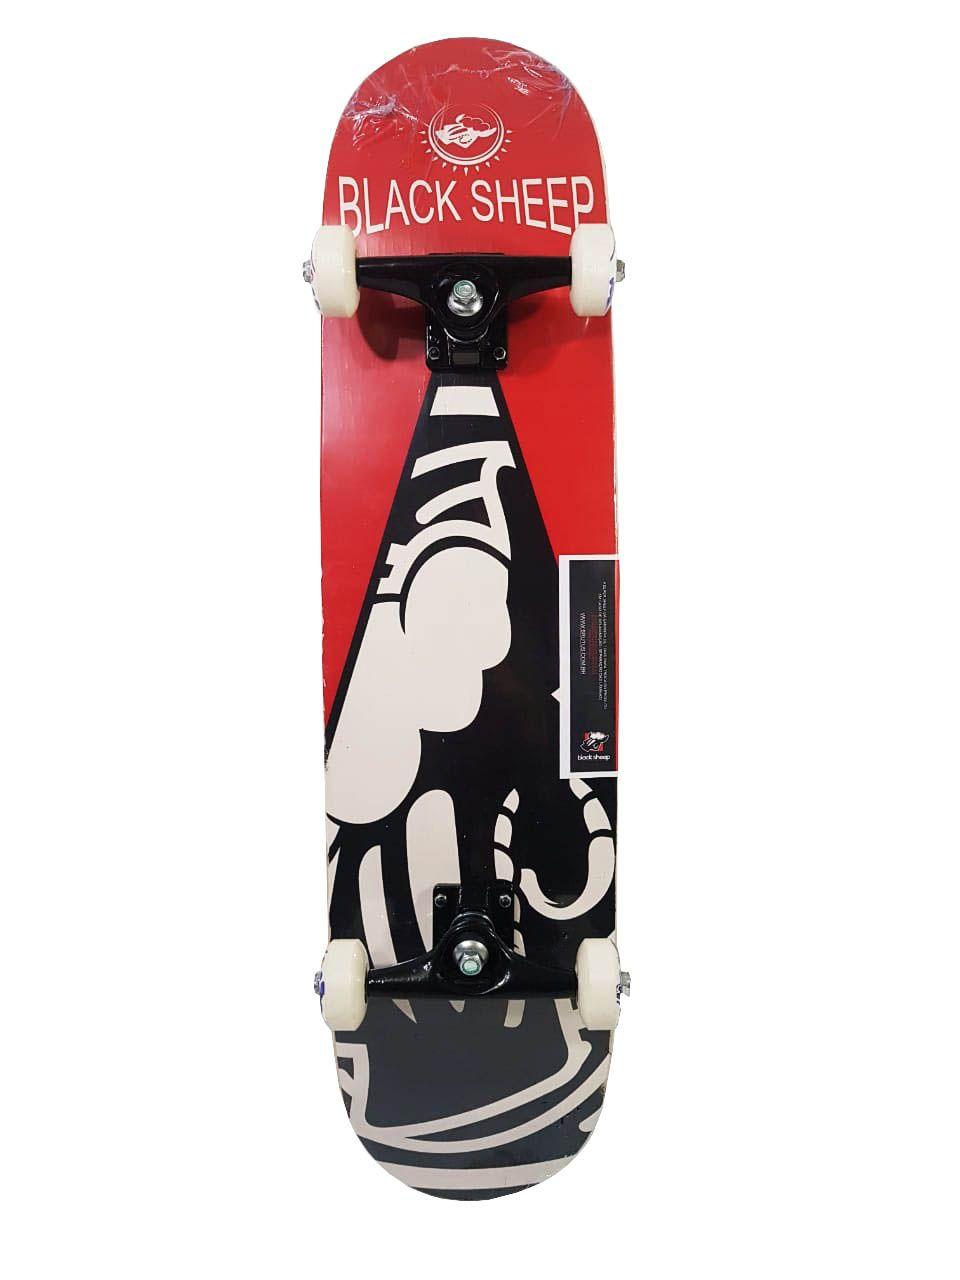 Skate Completo Black Sheep Iniciante Modelo 3